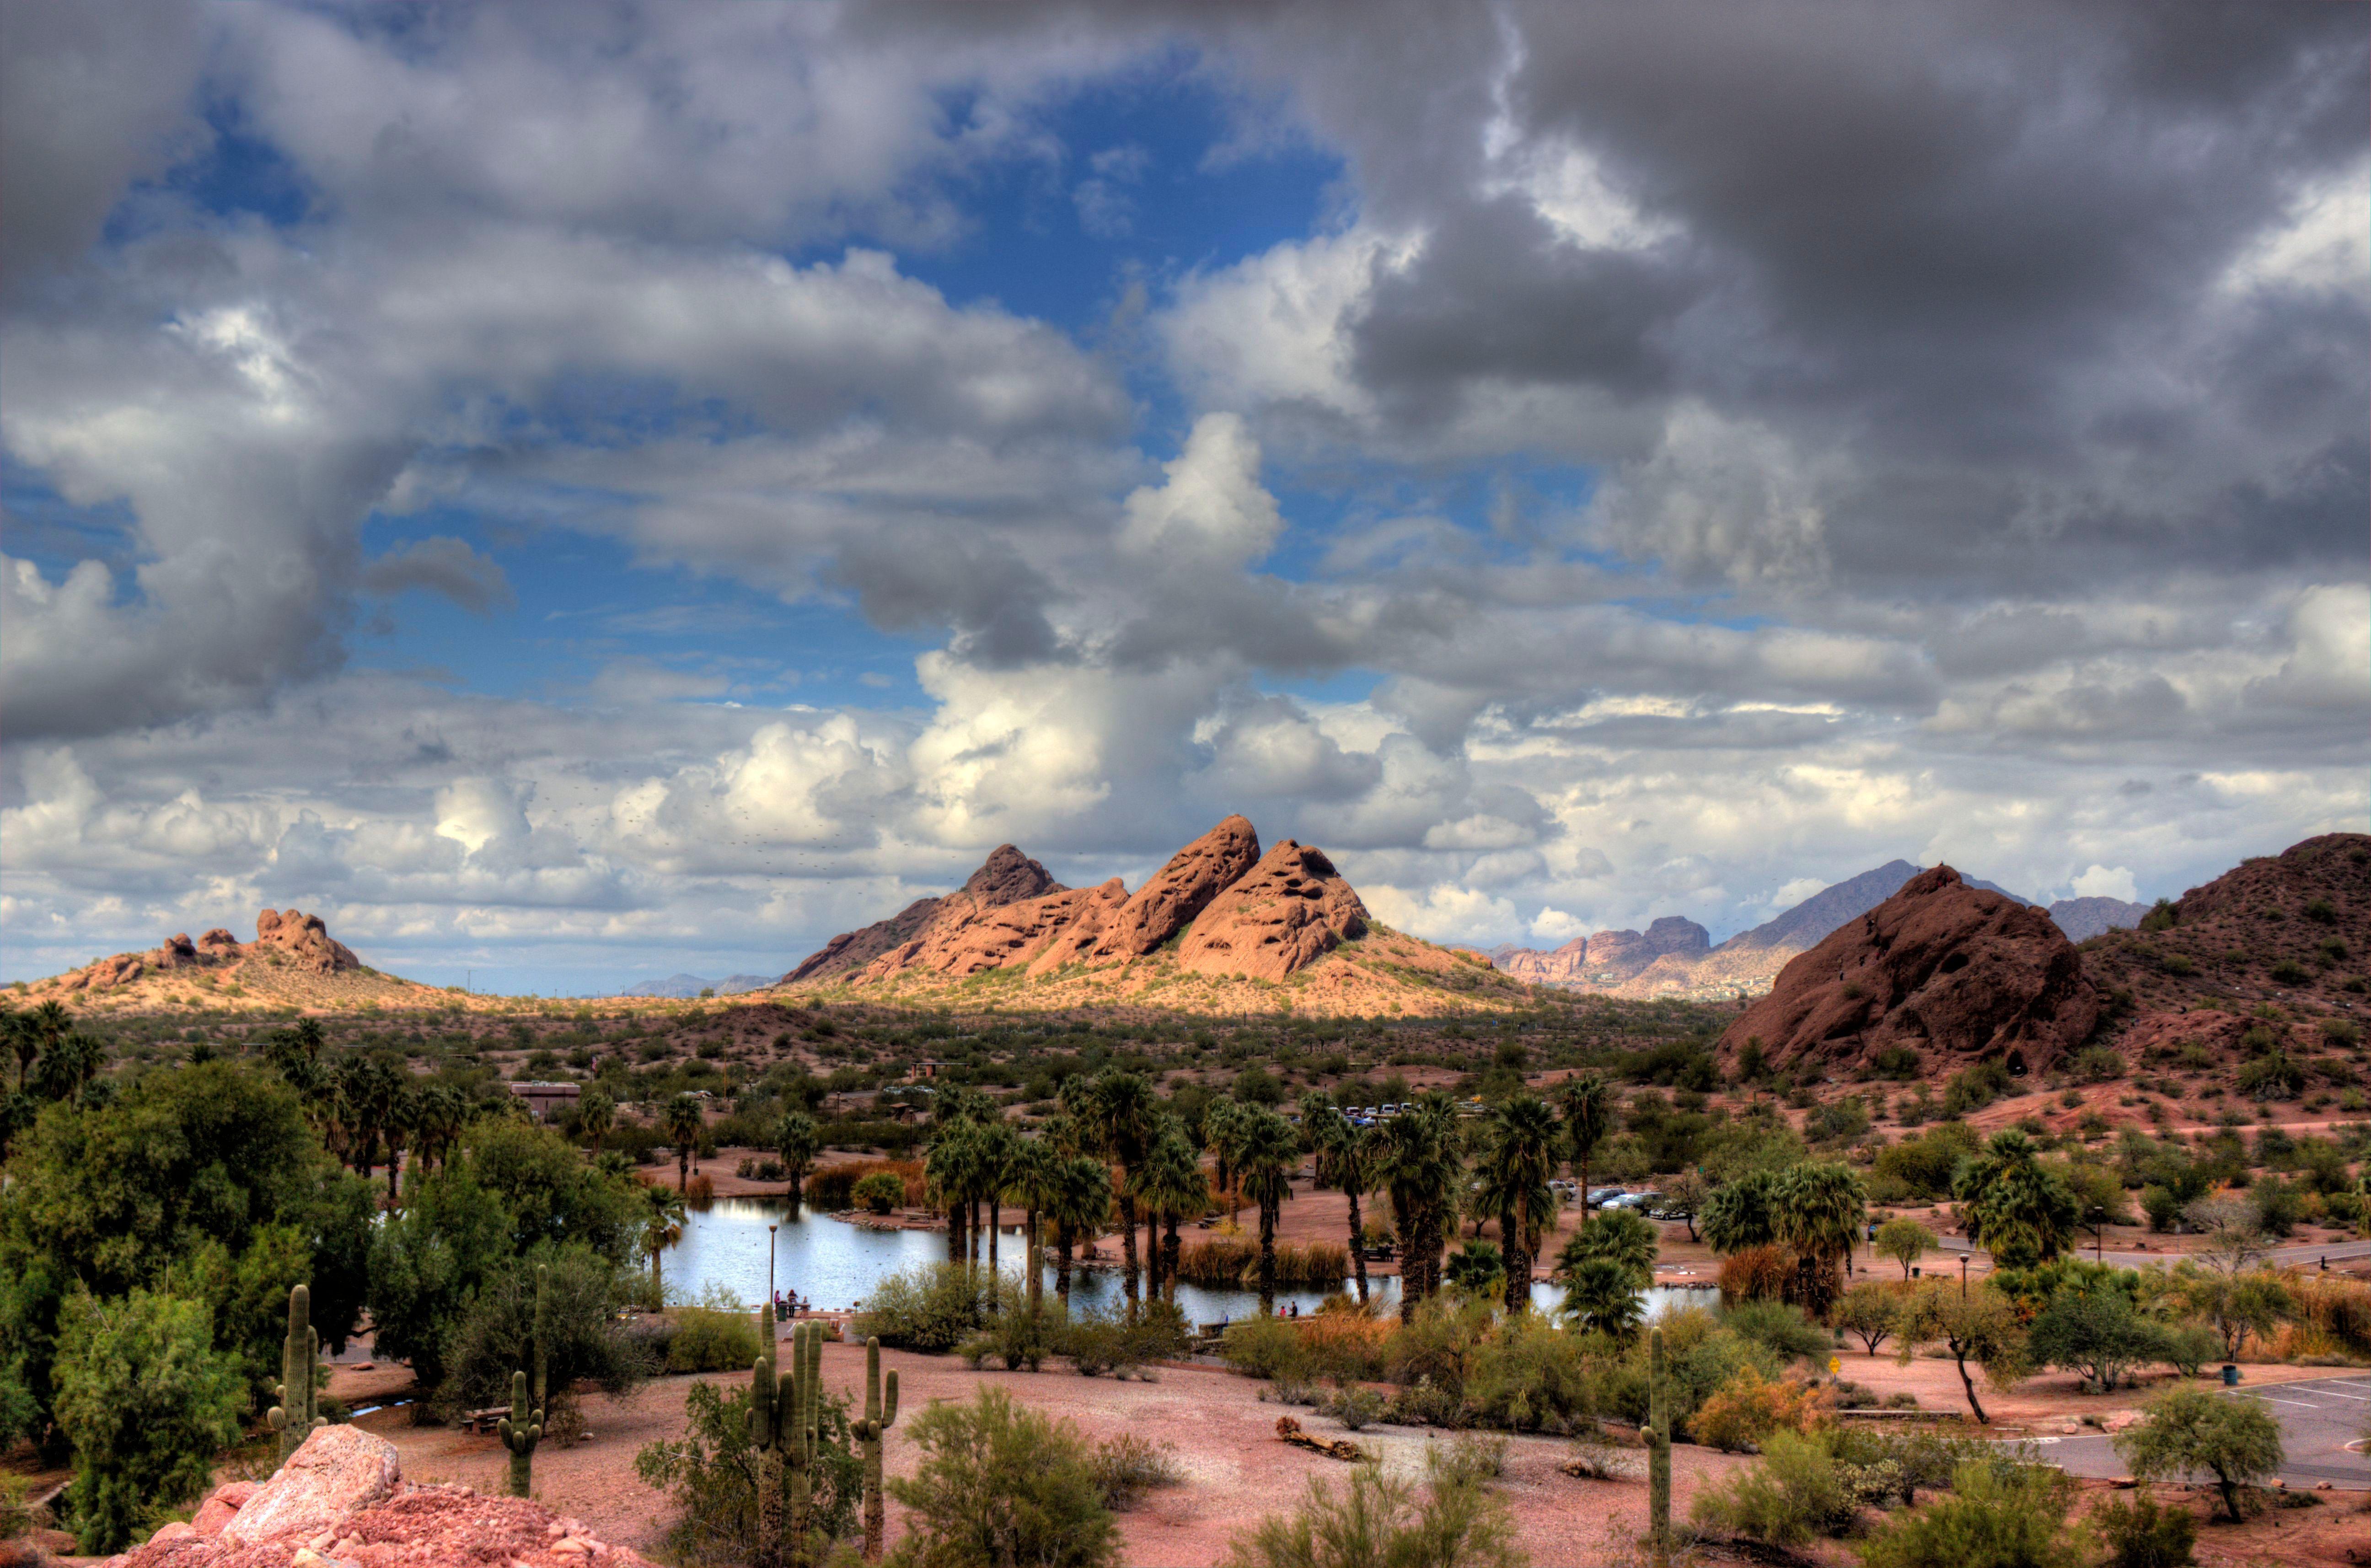 Paisaje del Papago Park en Phoenix